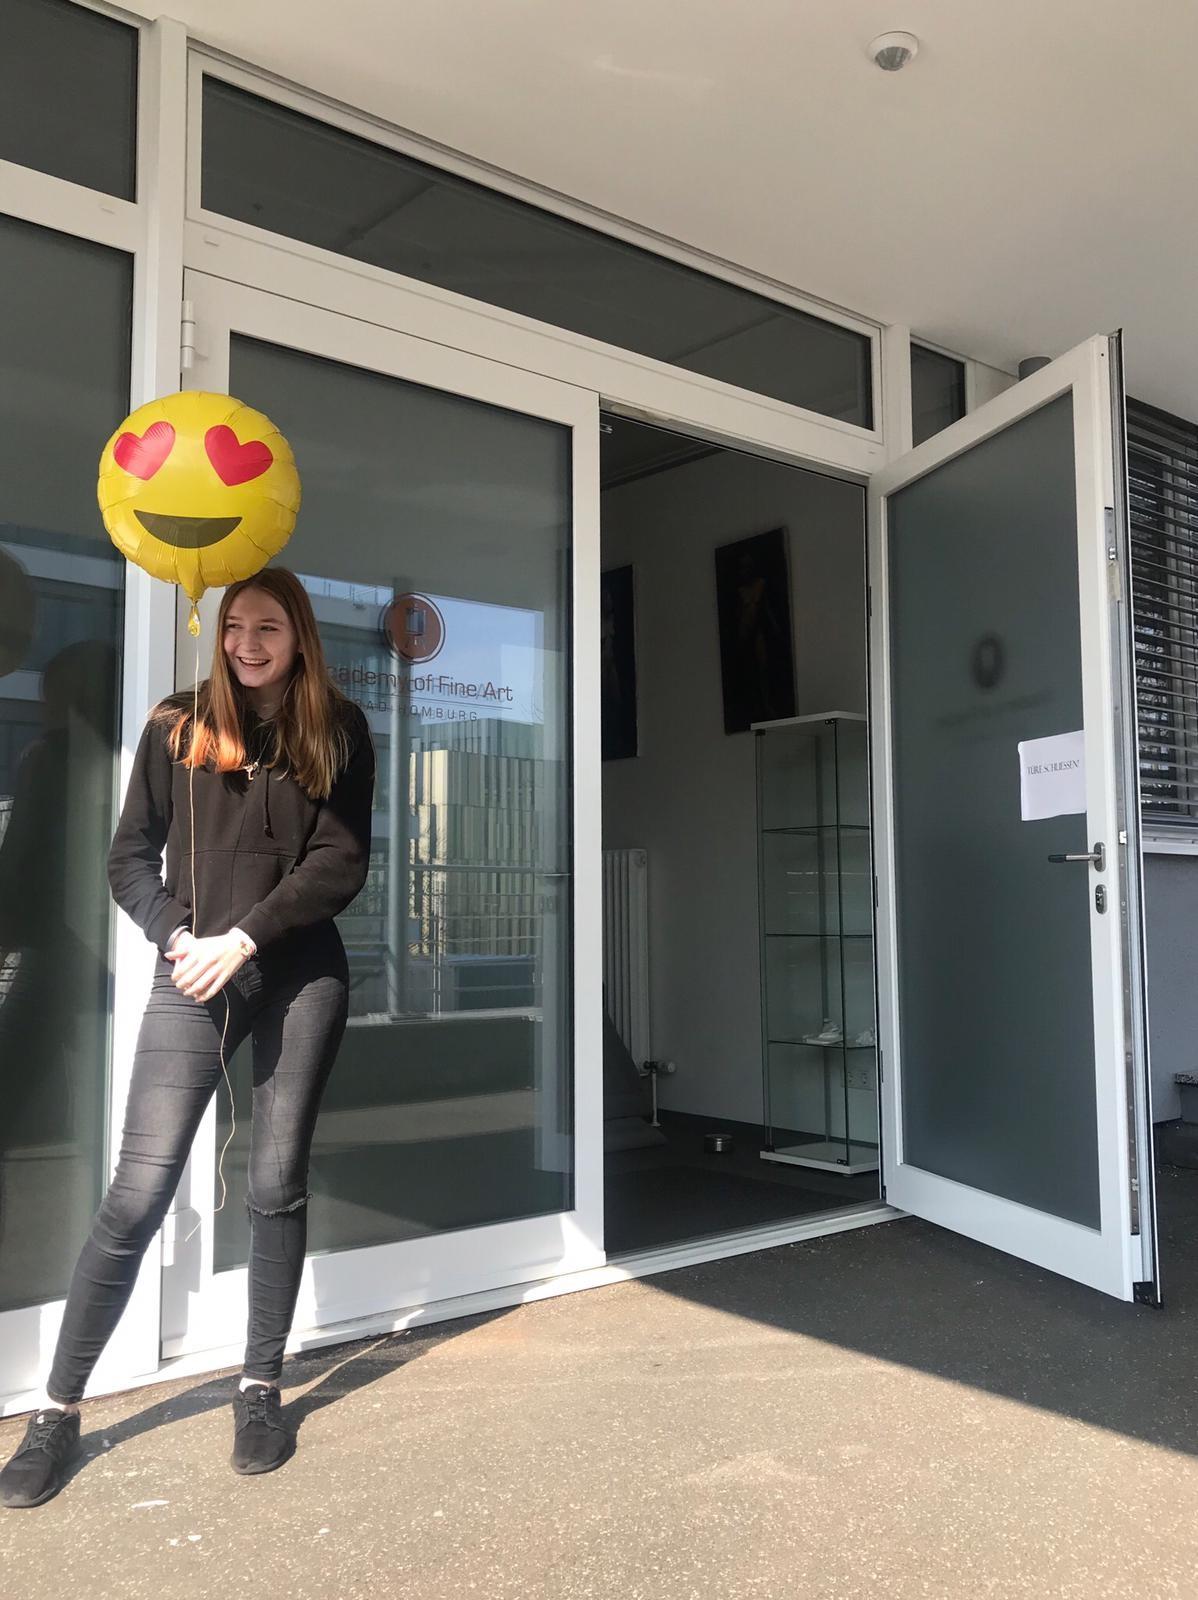 Sophie2 - My internship at the Academy of Fine Art